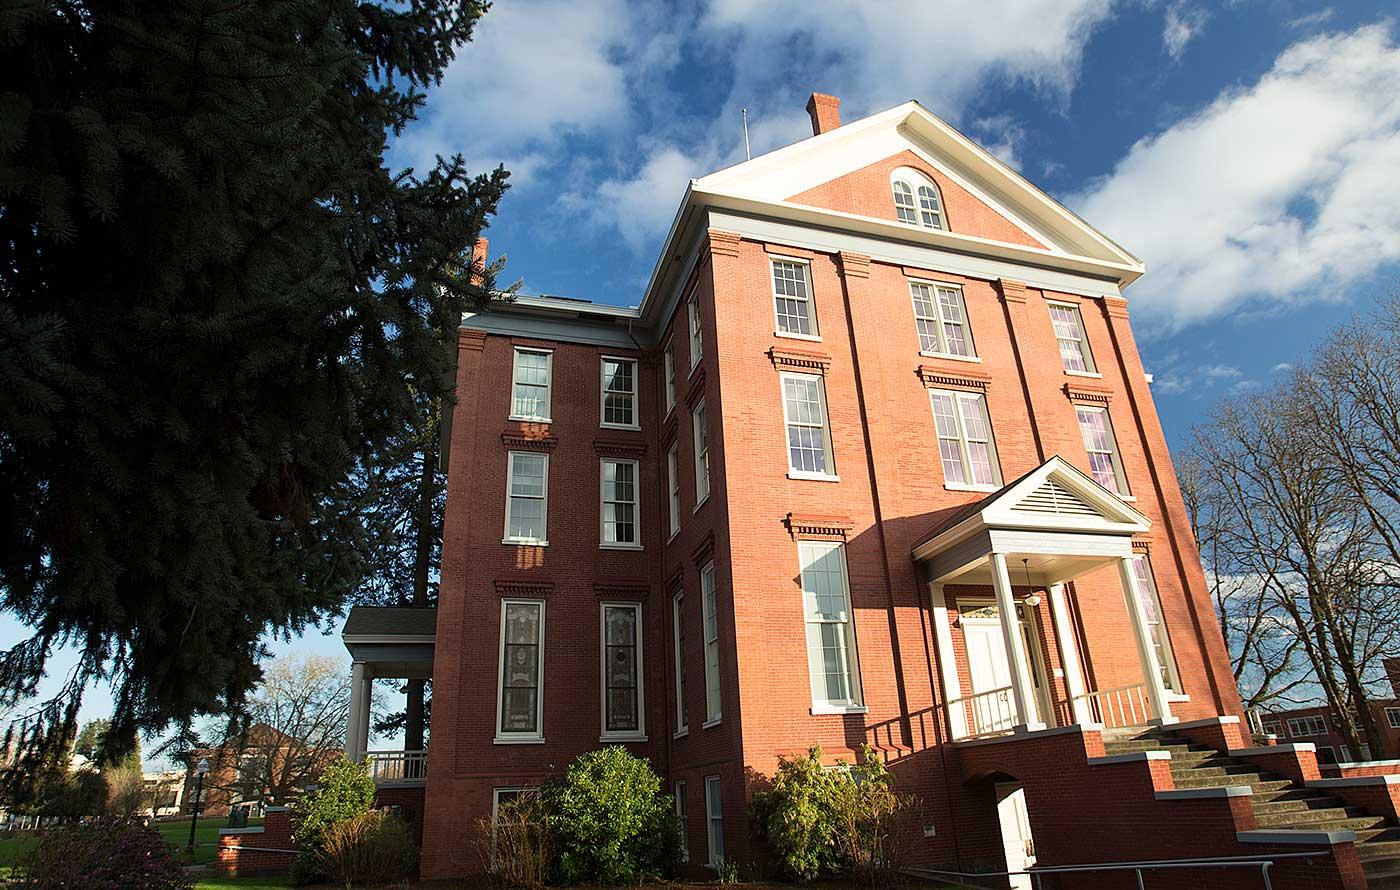 Willamette's Waller Hall